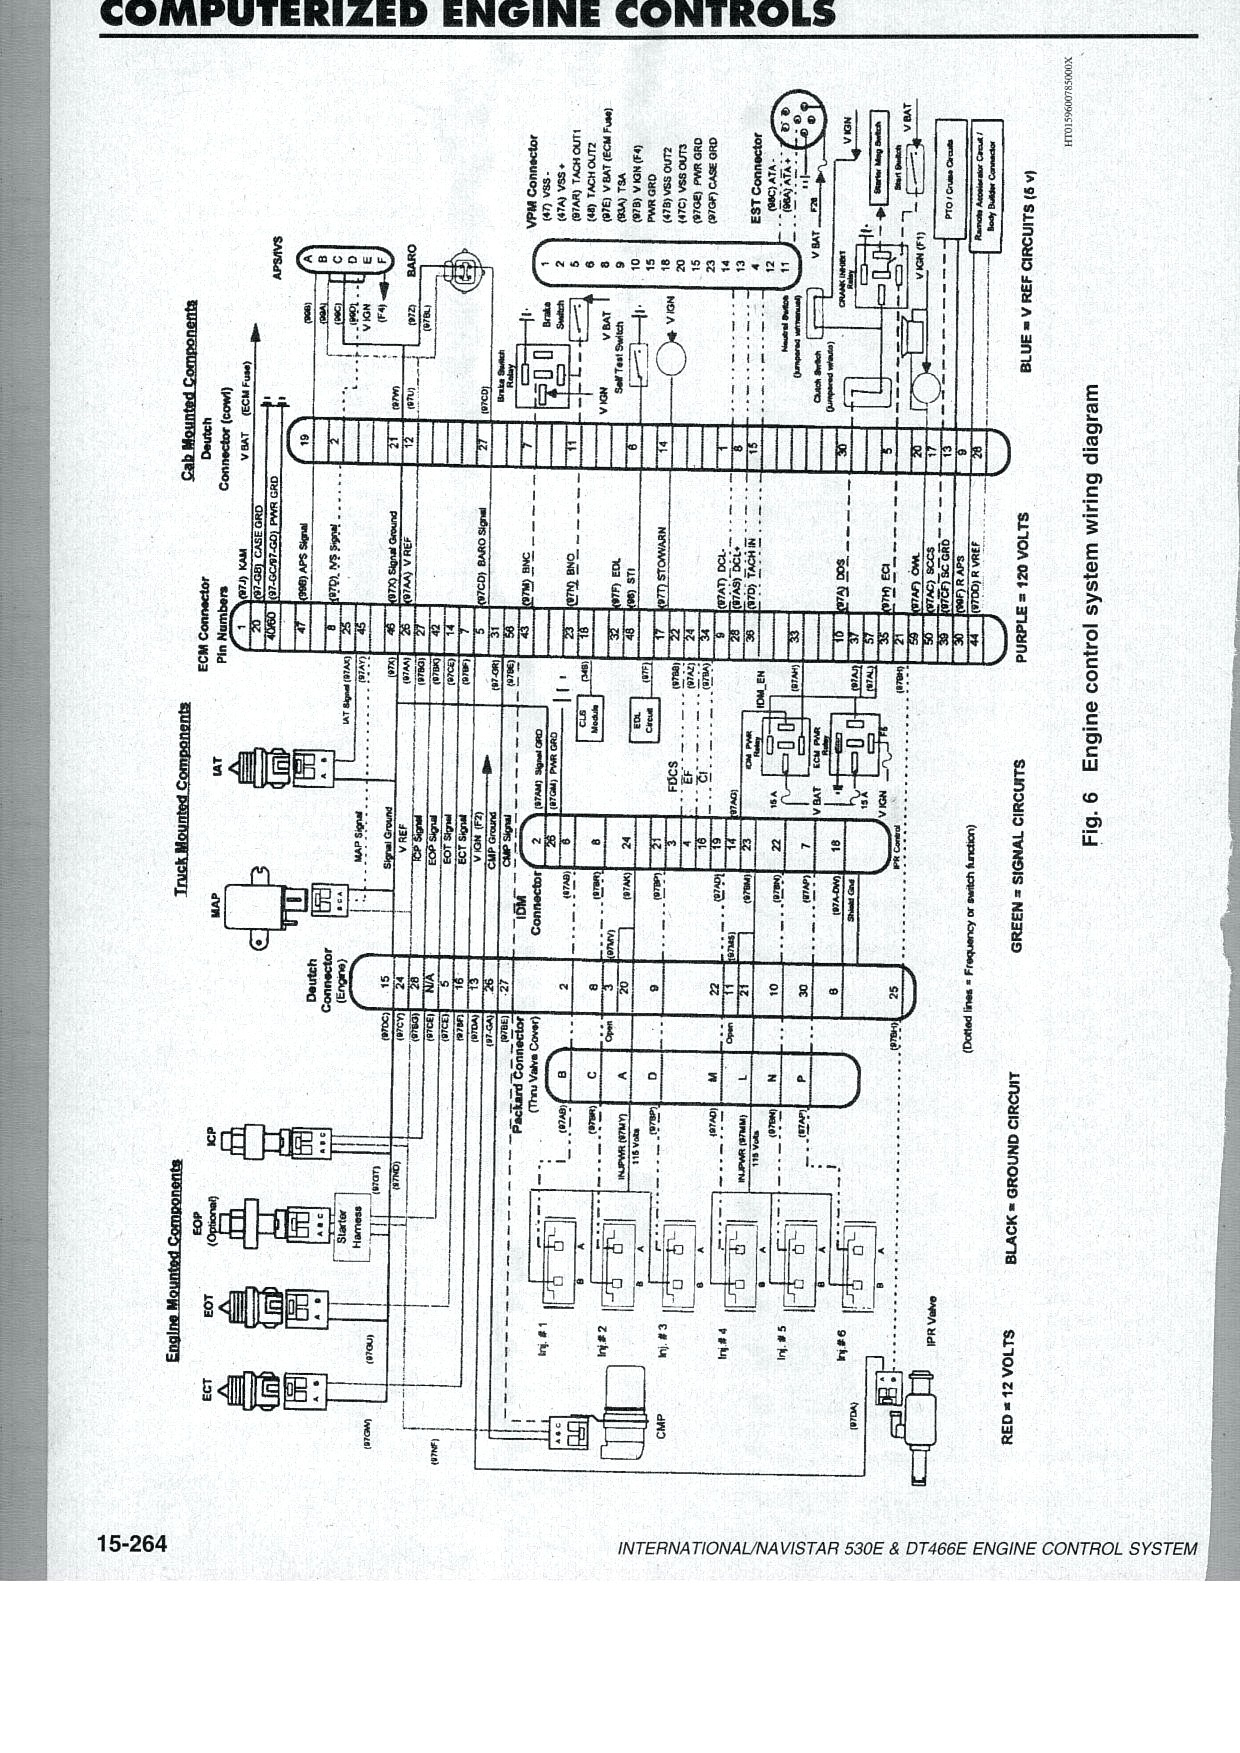 international truck wiring diagram wirings diagram2006 jeep commander trailer wiring diagram fresh magnificent 2004 international truck wiring diagram